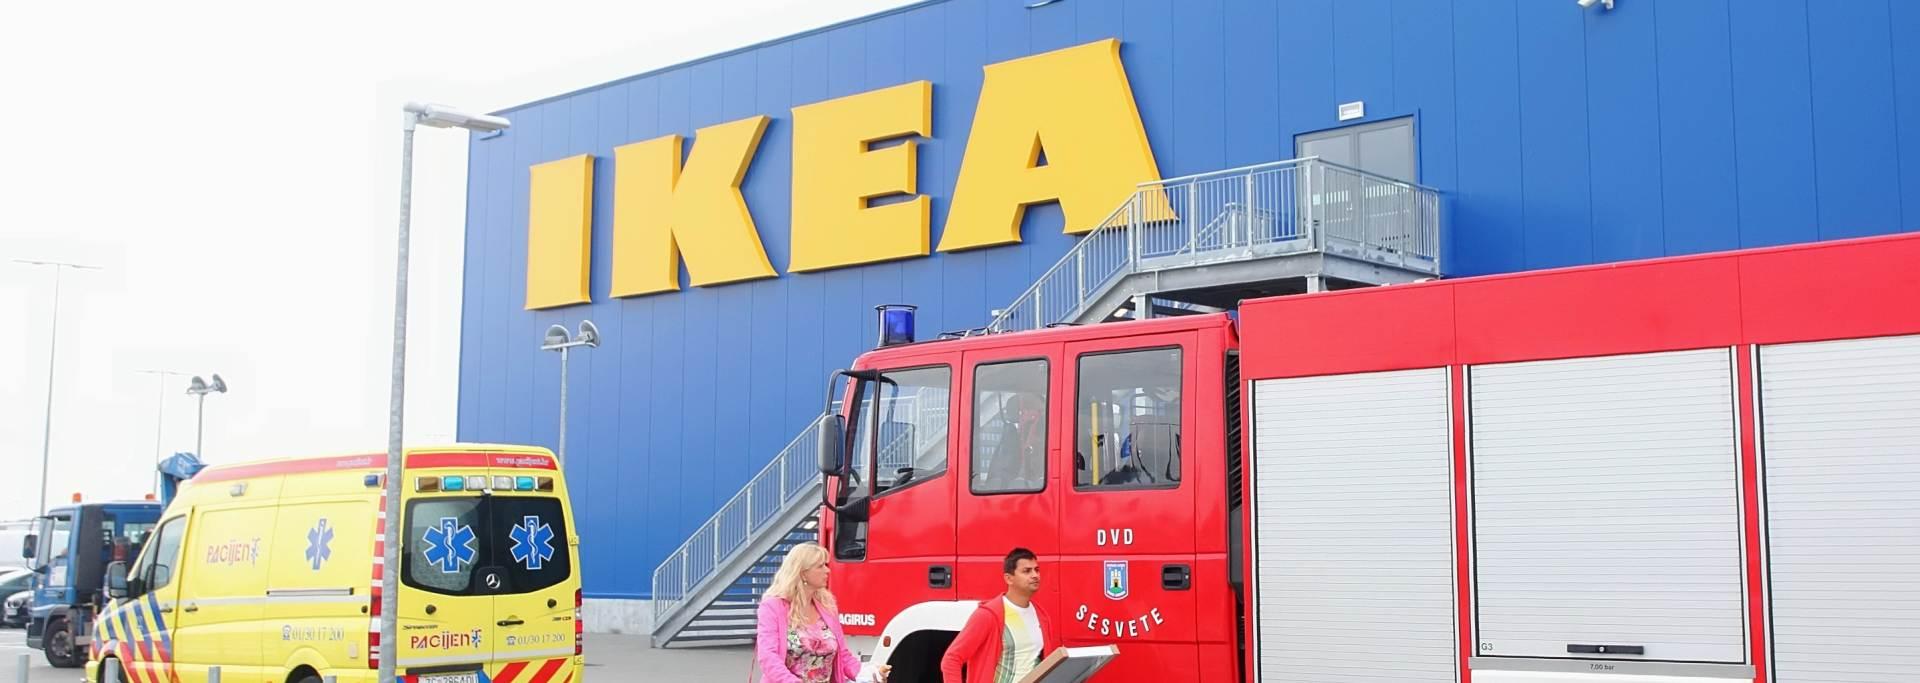 KUPCI ZAPREPAŠTENI: Zagrebačka Ikea jutros nakratko evakuirana